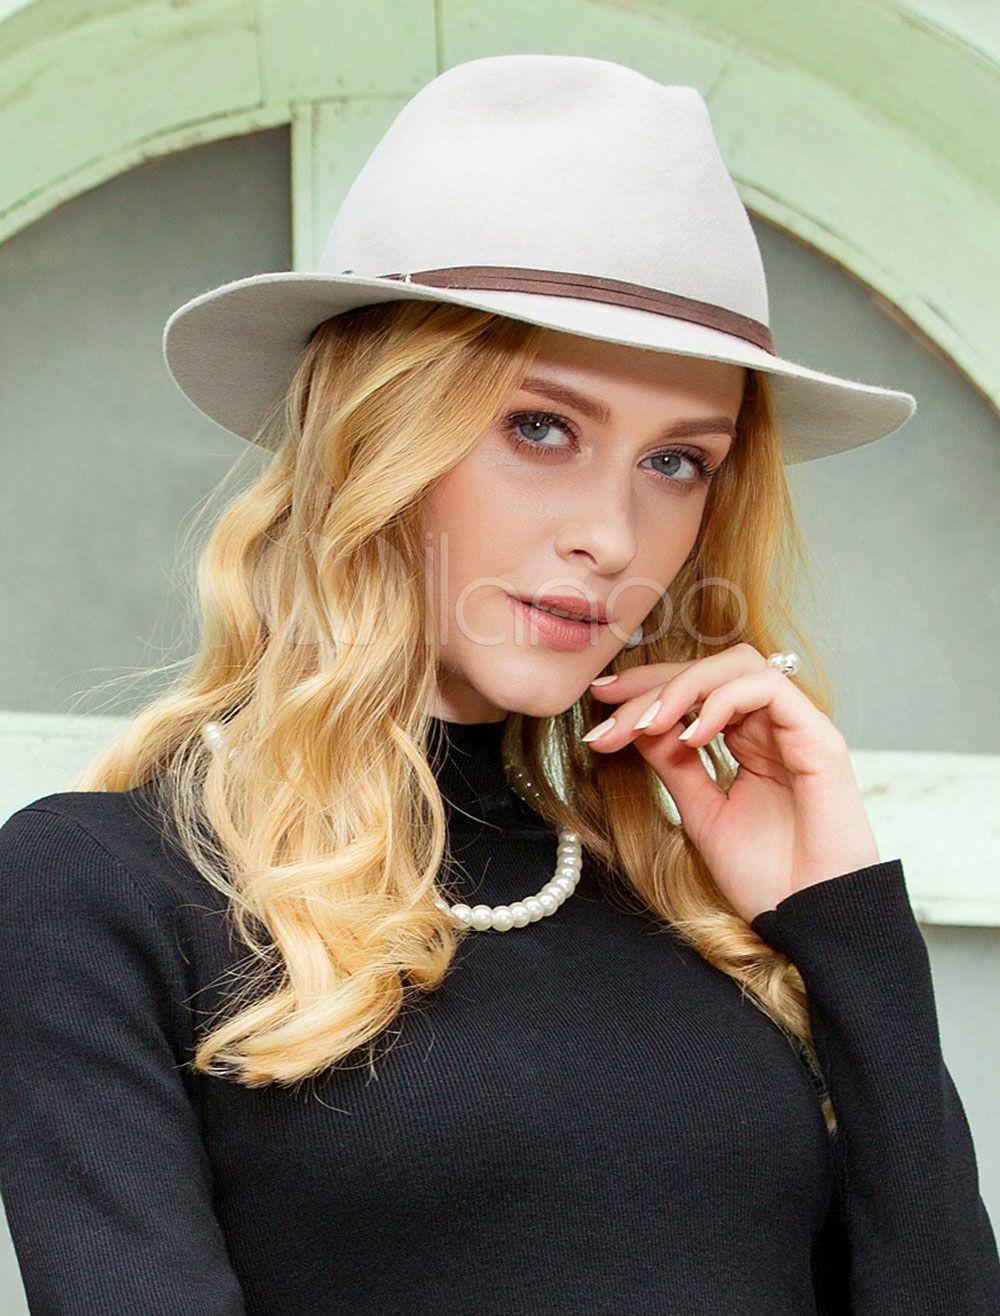 010cd237d5c7f7 Vintage Fedora Hat Wool Light Grey Winter Panama Hats For Women #Wool, # Light, #Hat